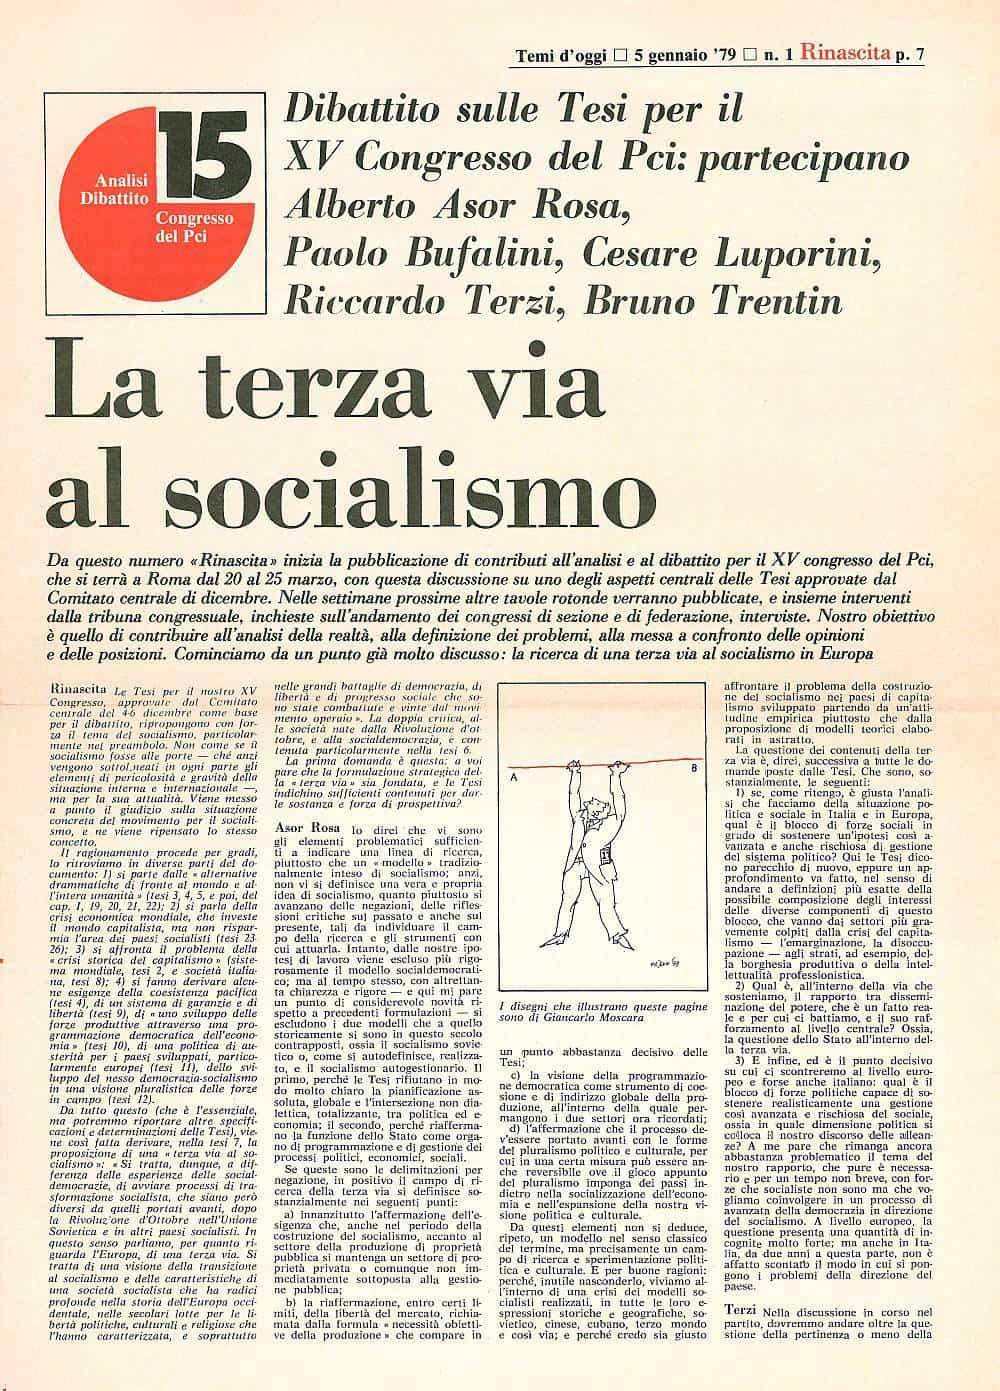 G33 - La terza via al socialismo